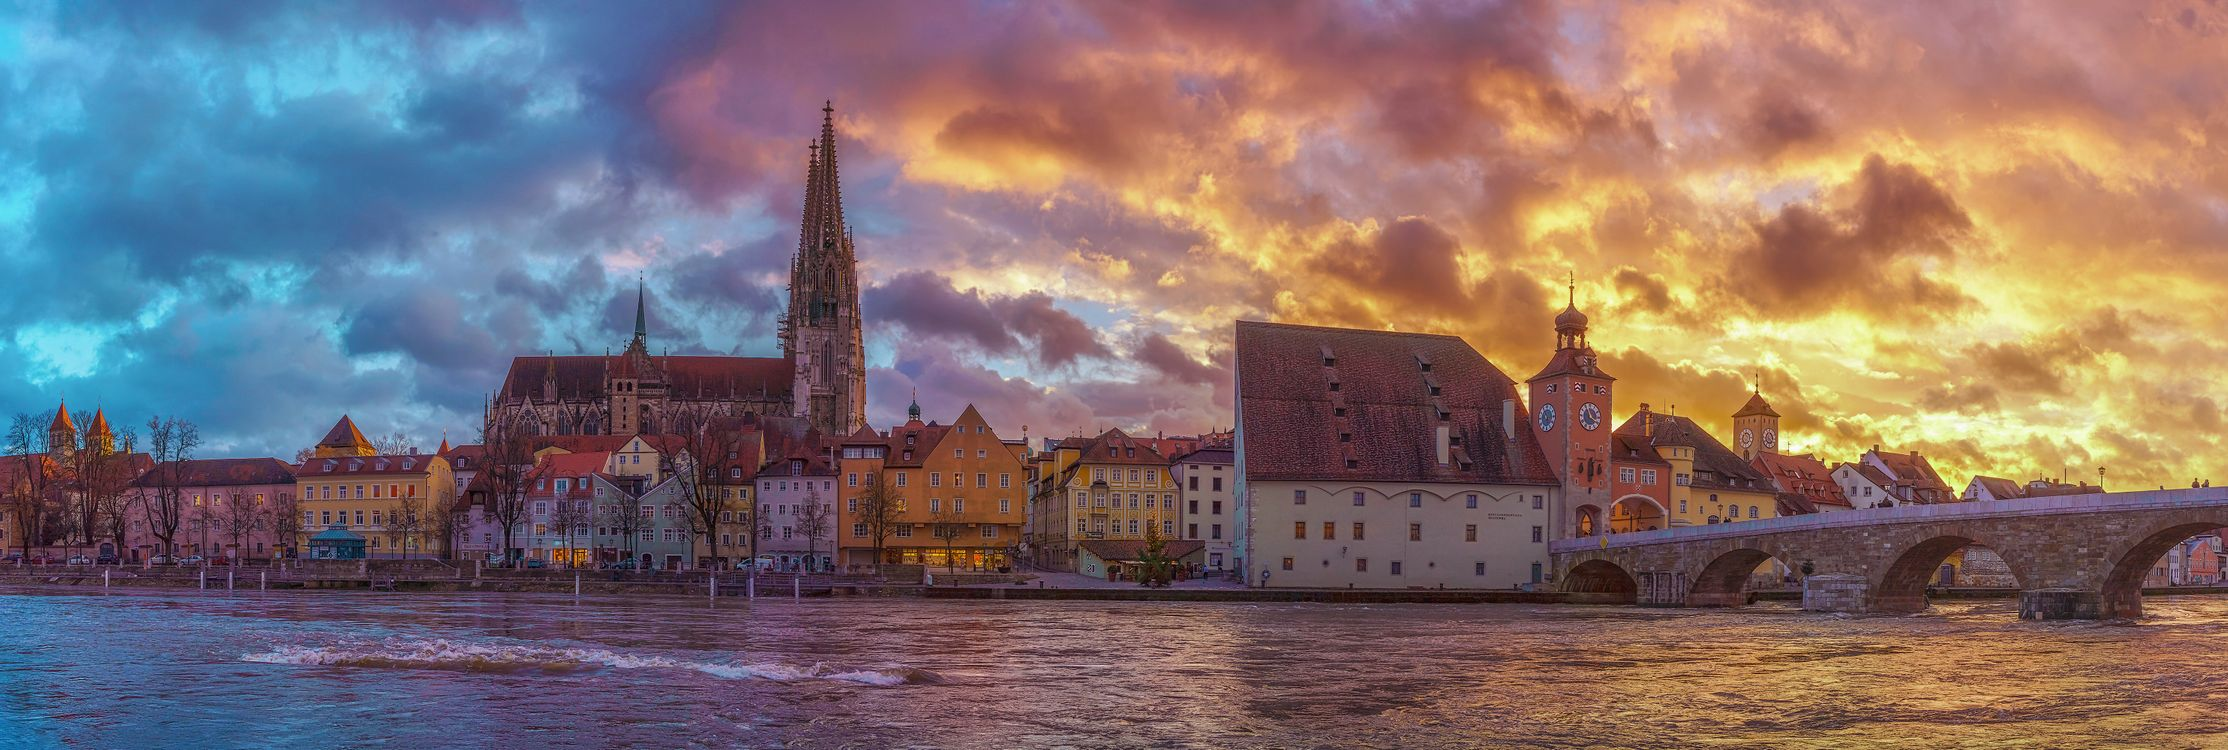 Фото бесплатно Регенсбург, Bavaria, Германия, небо, здание, закат солнца, вода, башня, река, мост, панорама, город